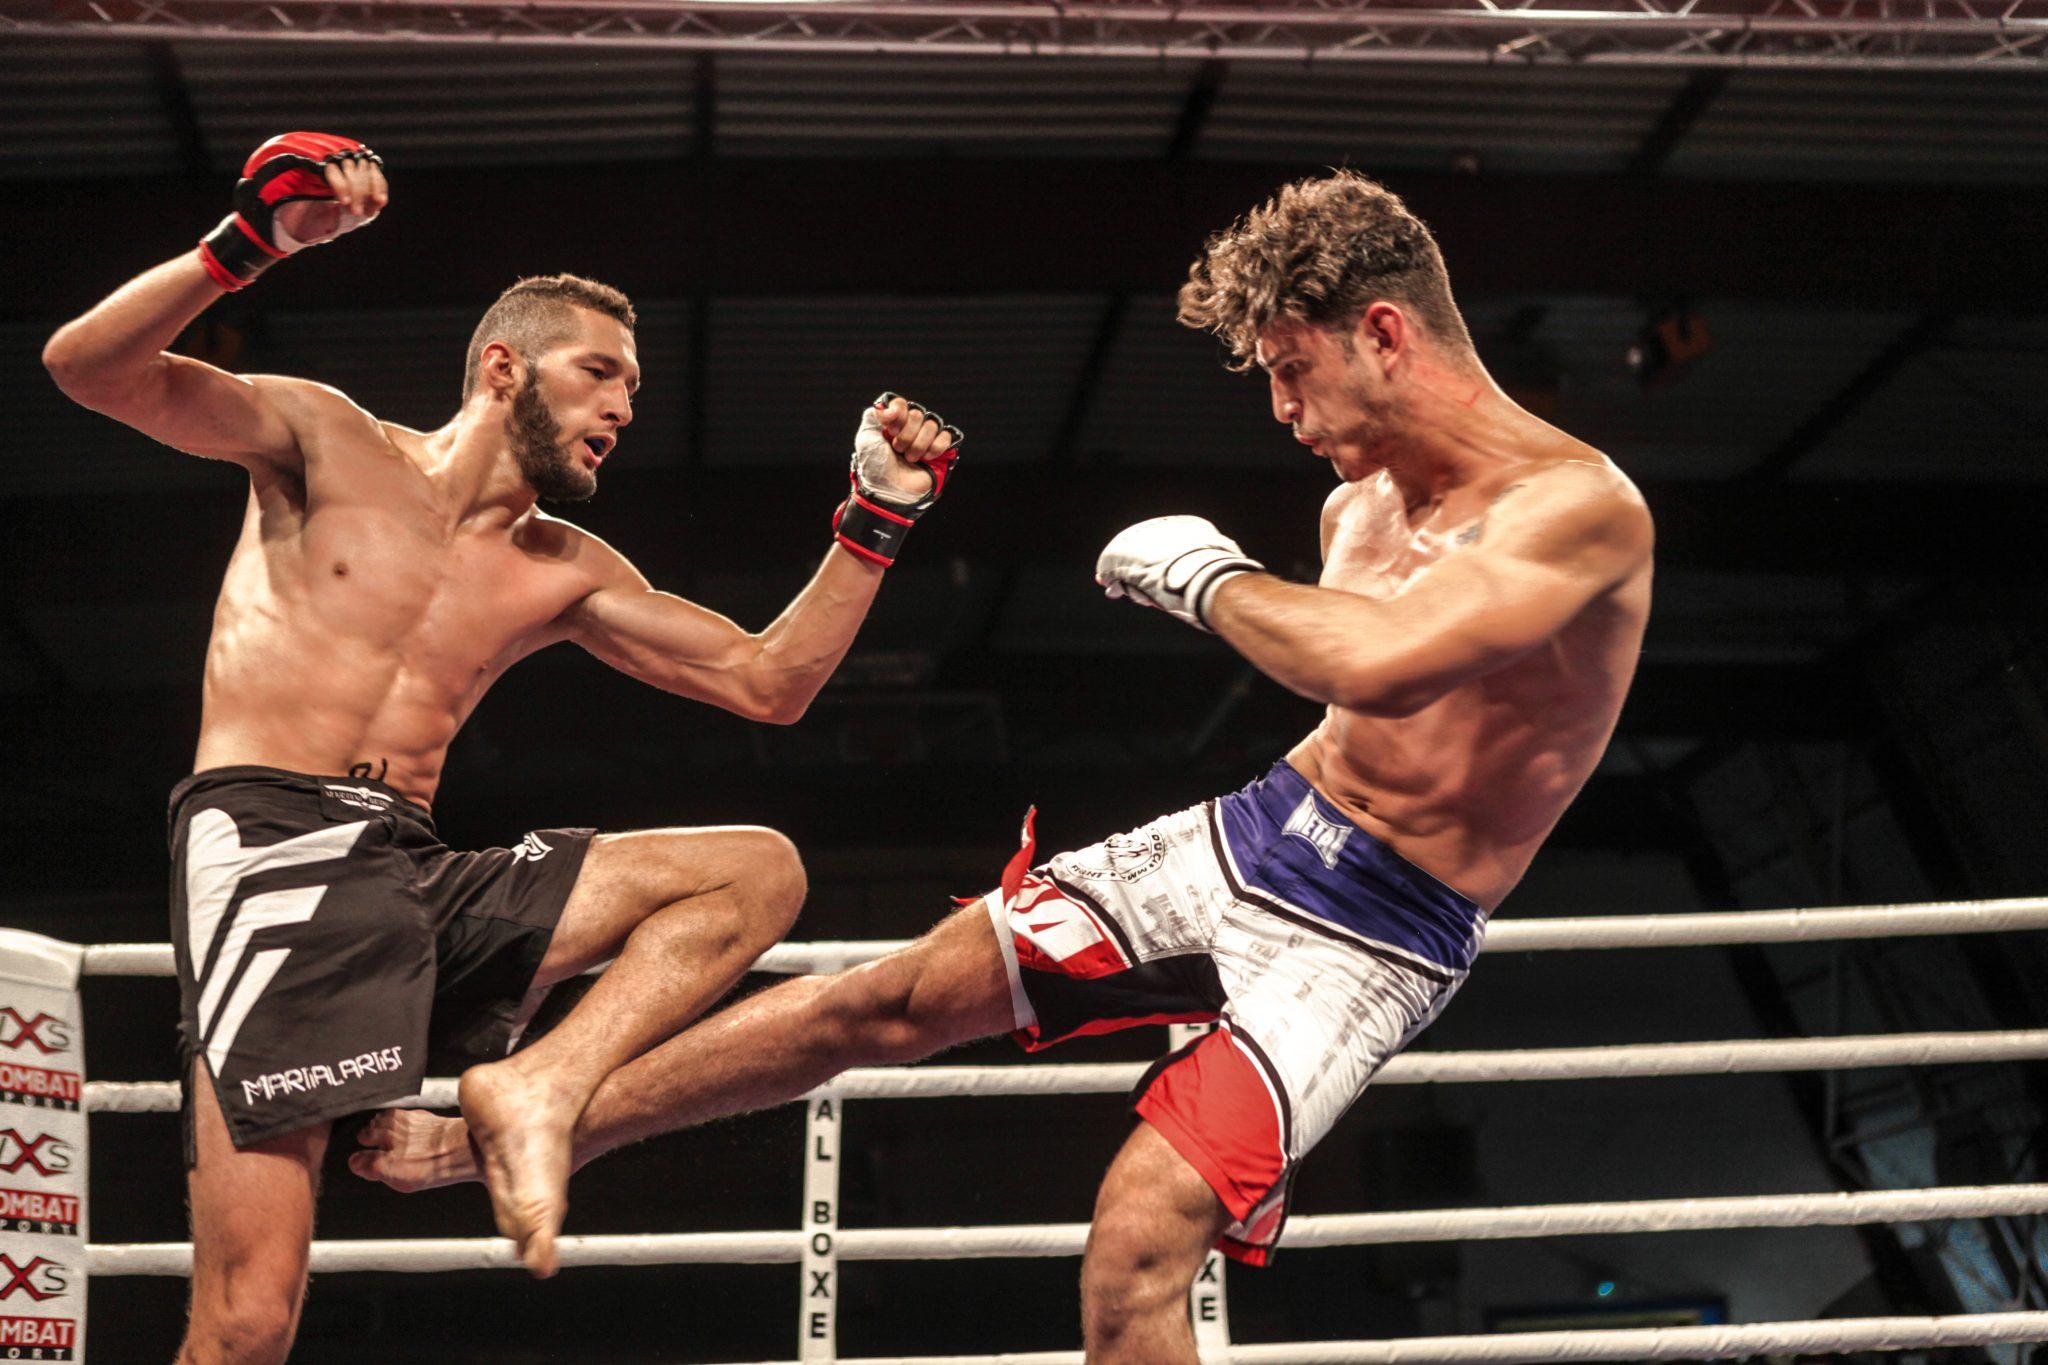 Boxe-thai1306-48